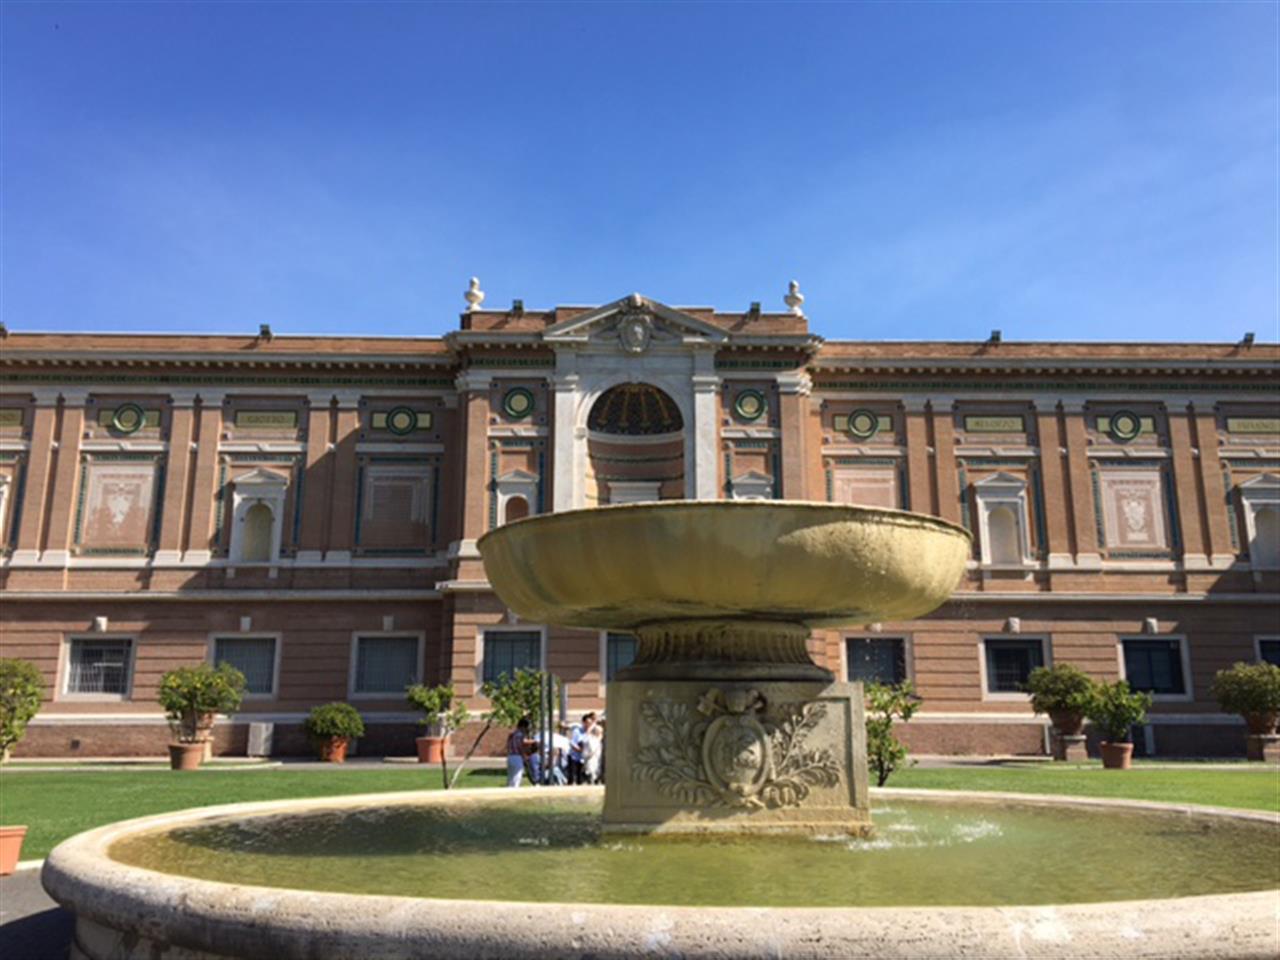 #leadingrelocal #Rome #Italy #Vatican